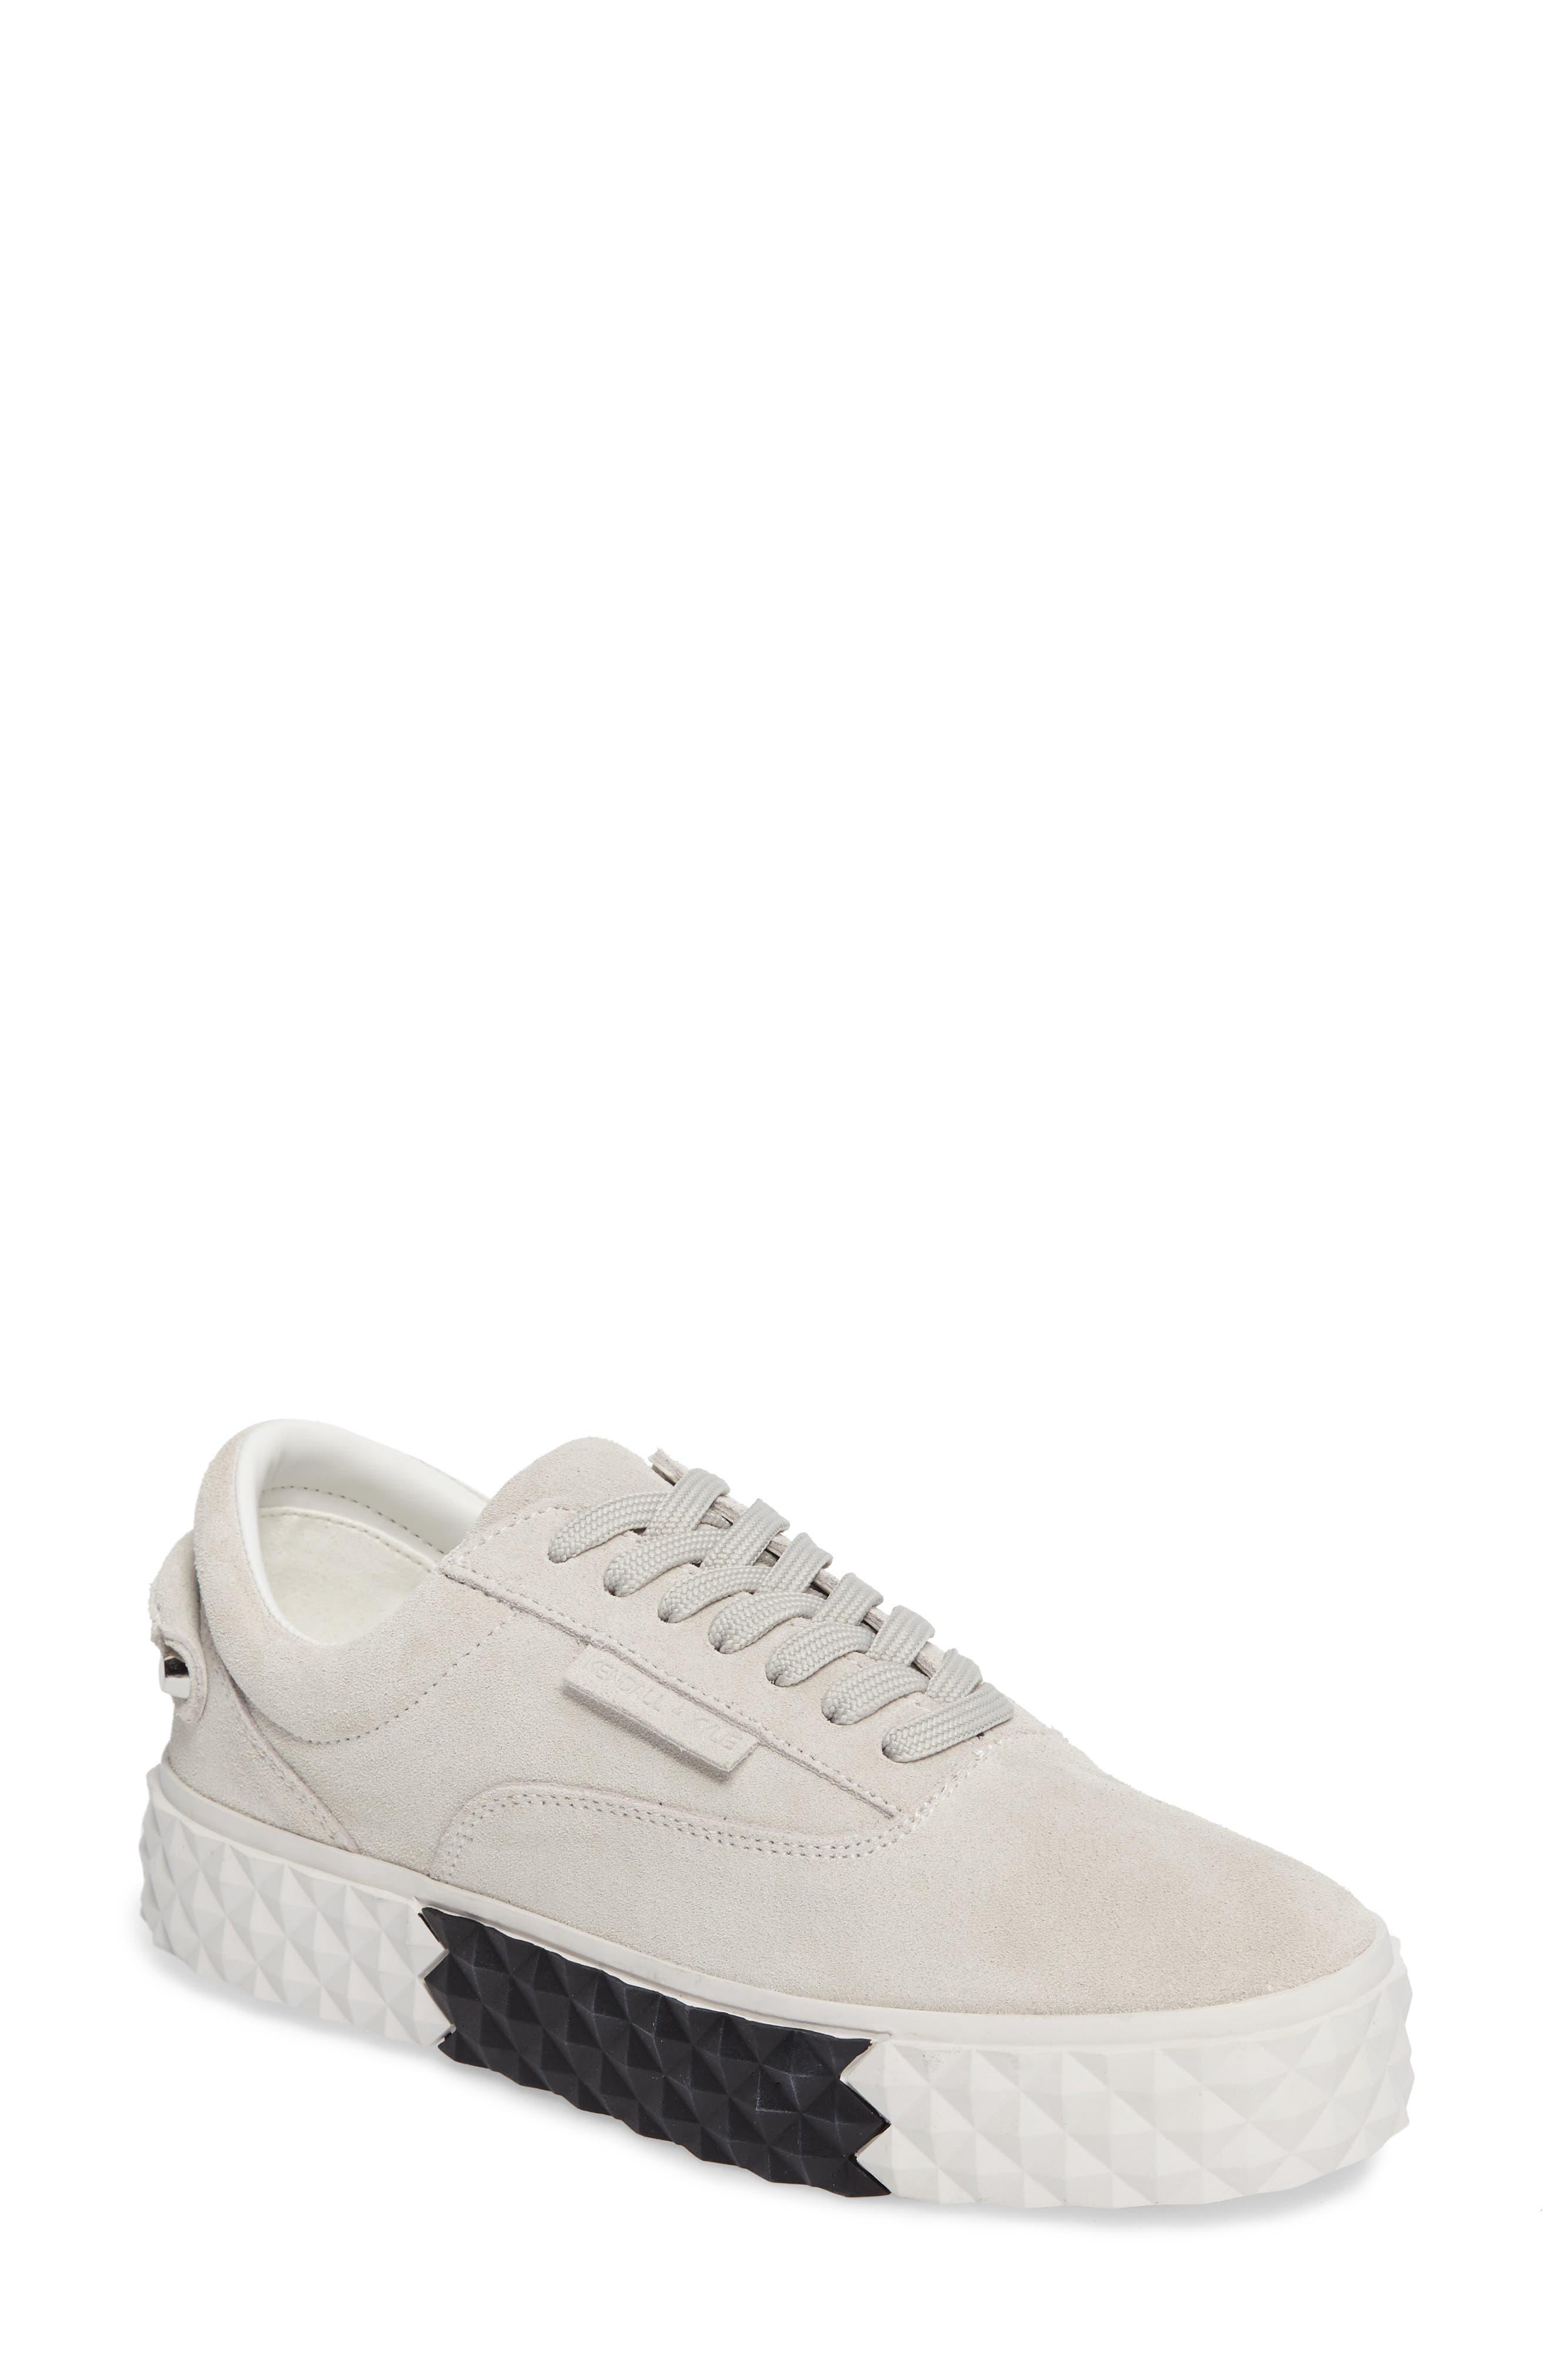 Reign Platform Sneaker,                         Main,                         color, White